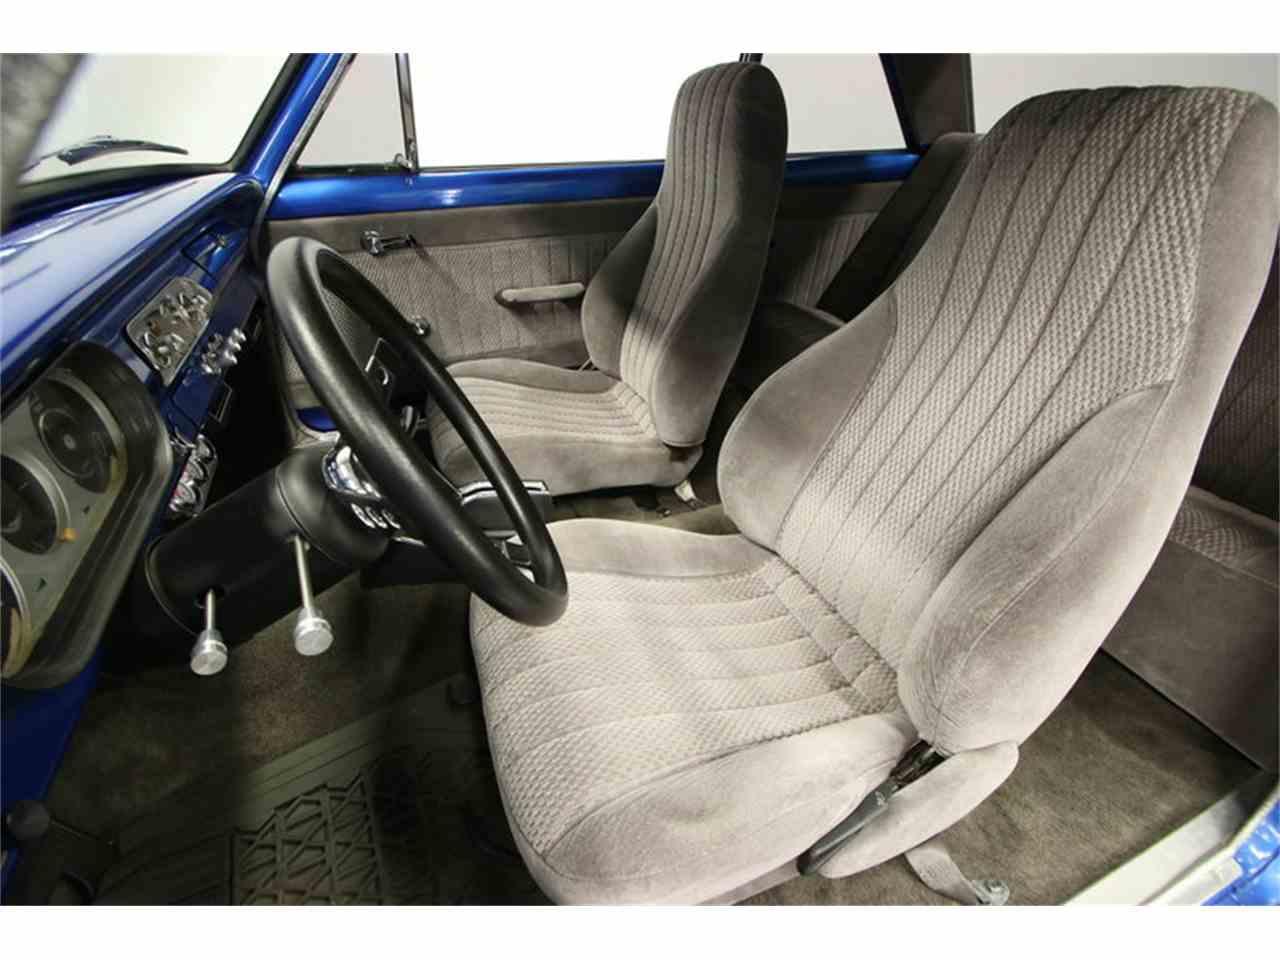 All Chevy 64 chevy ii 1964 Chevrolet Chevy II Nova Restomod for Sale | ClassicCars.com ...